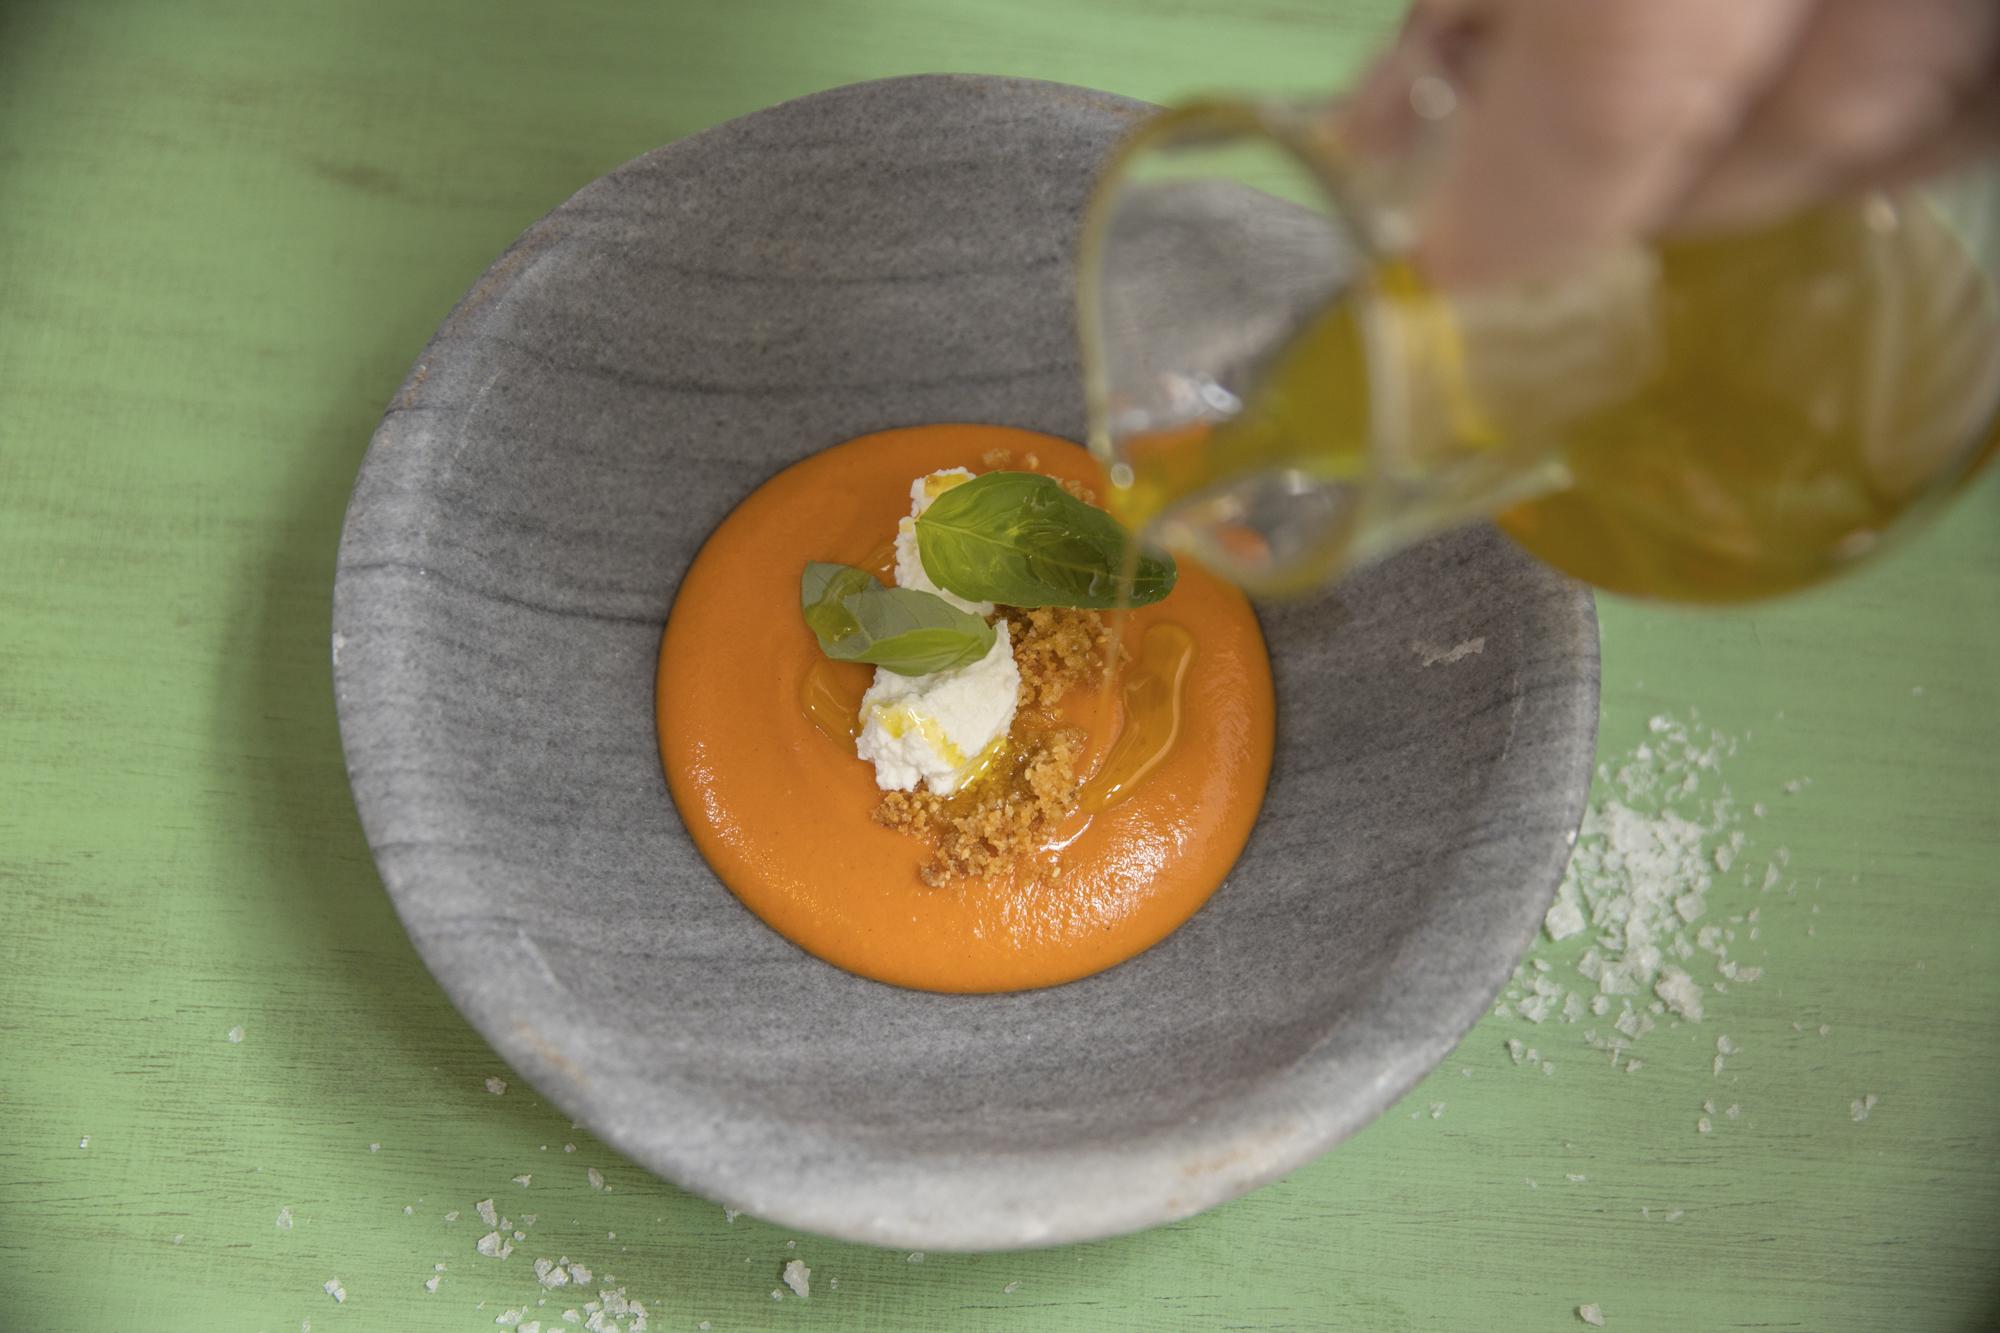 Spanien Andalusien, Provinz Cordoba, Priego de Cordoba, Restaurant Patria Chica, Salmorejo wird mit Olivenöl serviert.